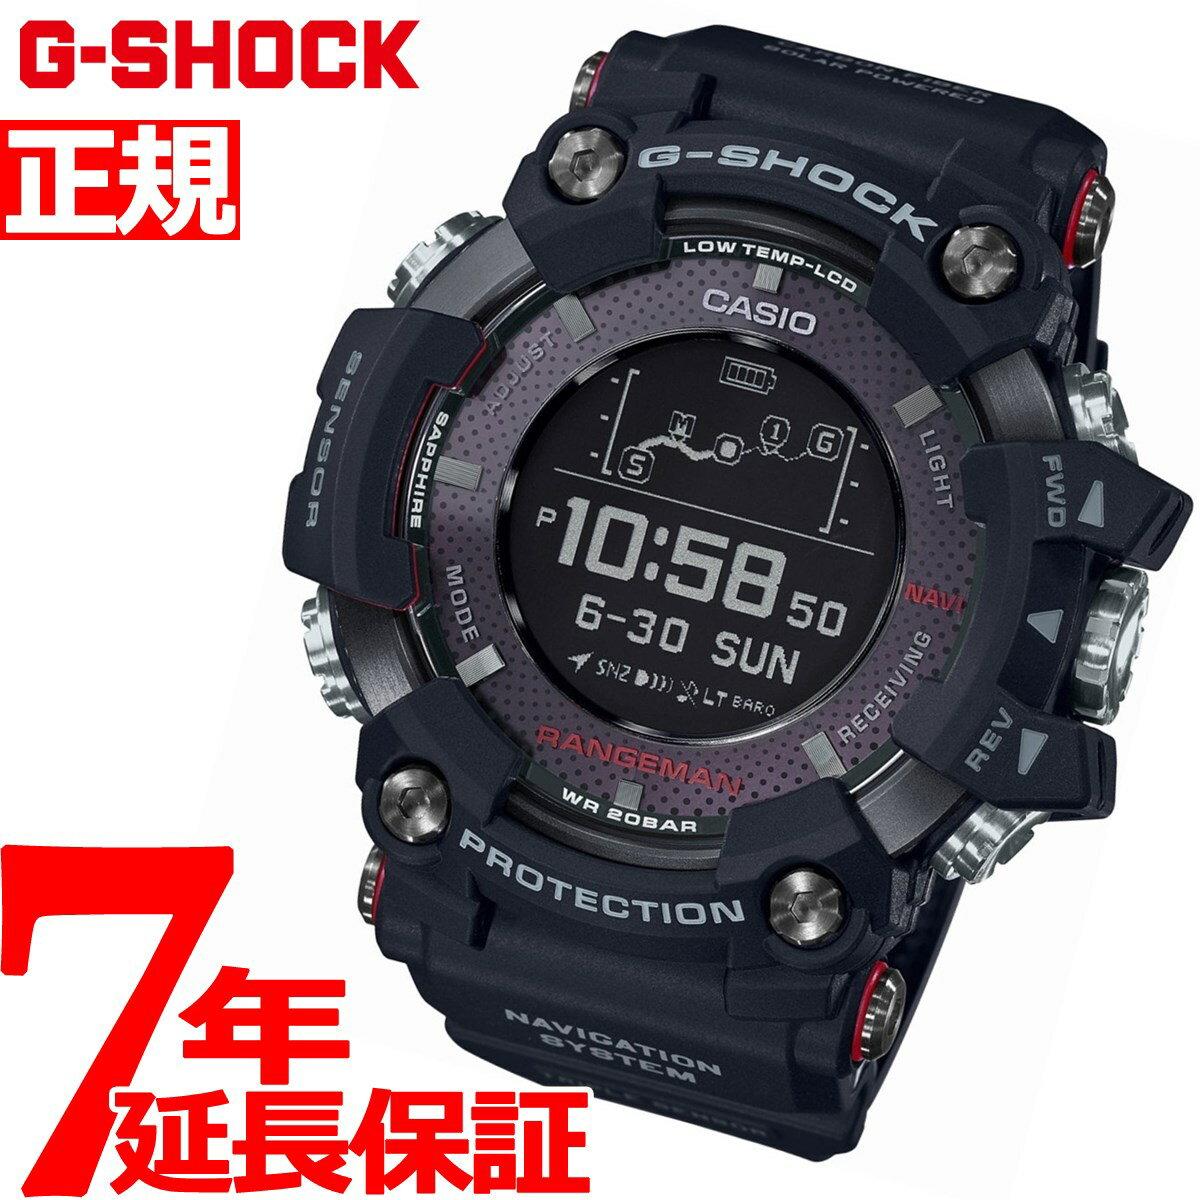 G-SHOCK GPS 電波 ソーラー 電波時計 カシオ Gショック レンジマン CASIO RANGEMAN Bluetooth搭載 腕時計 メンズ GPR-B1000-1JR【2018 新作】【あす楽対応】【即納可】